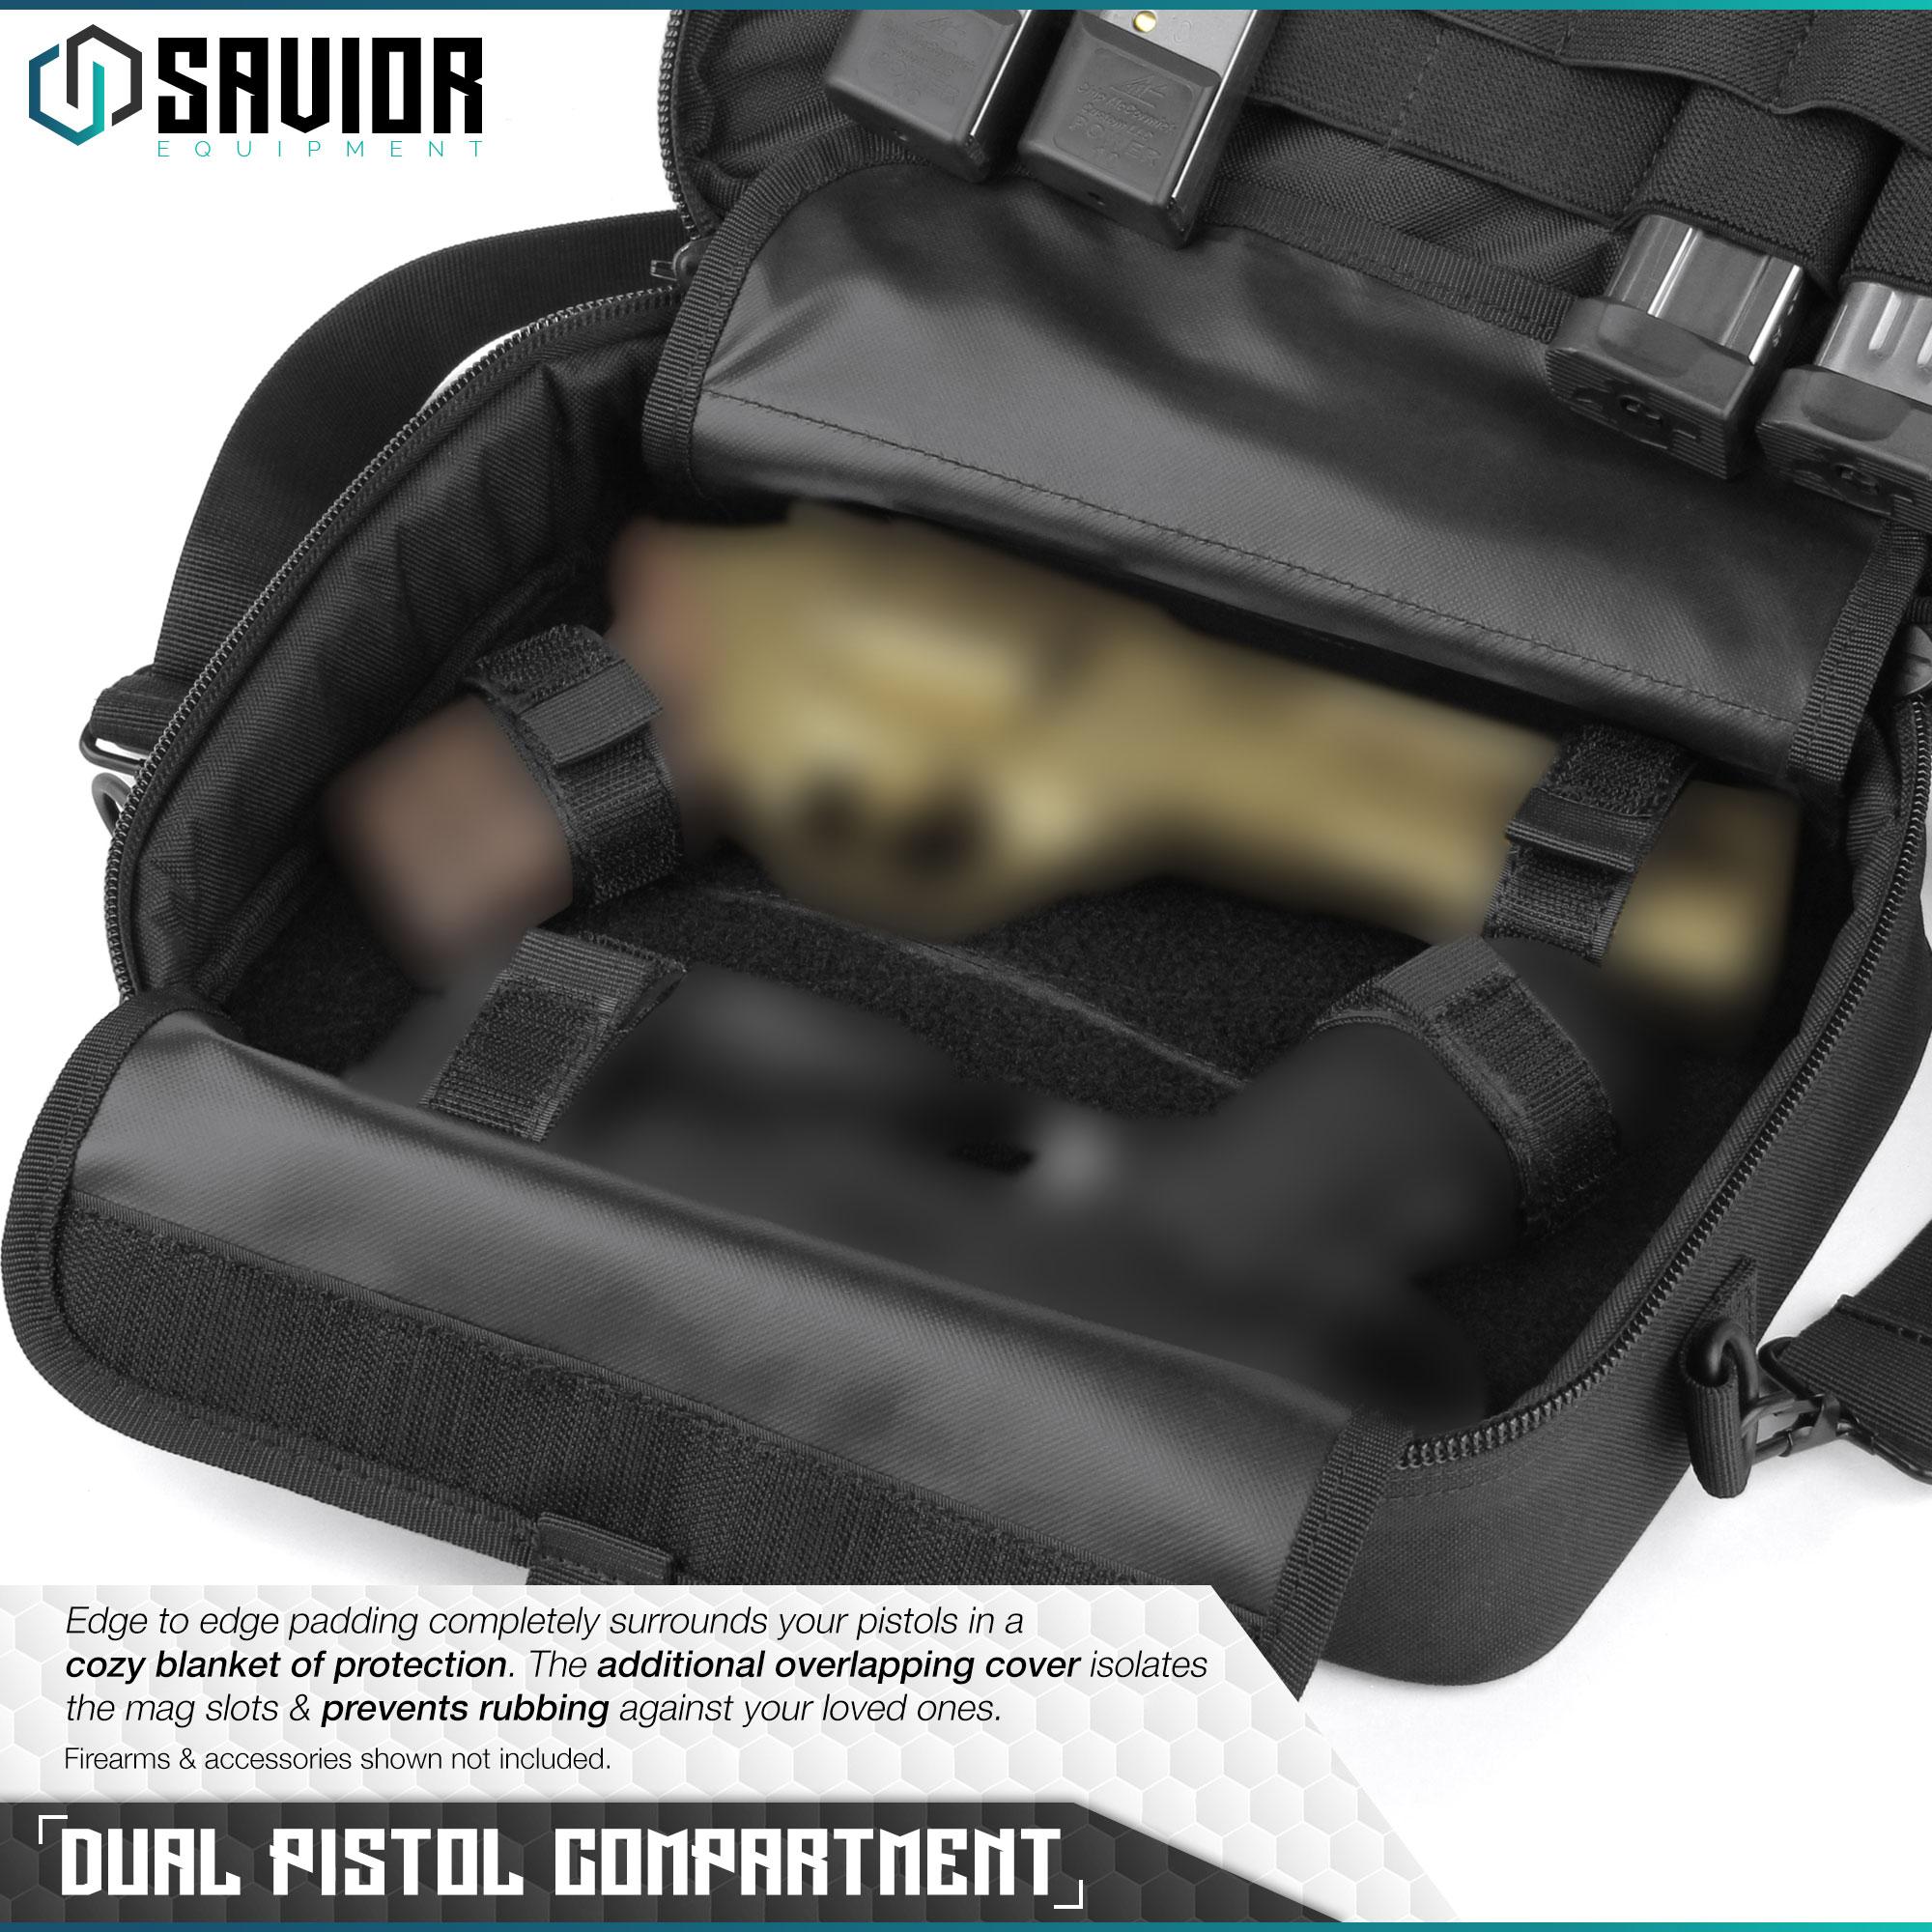 034-SAVIOR-034-Padded-Discreet-Double-Handgun-Bag-Pistol-Storage-Case-w-Mag-Pouch-Slot thumbnail 15